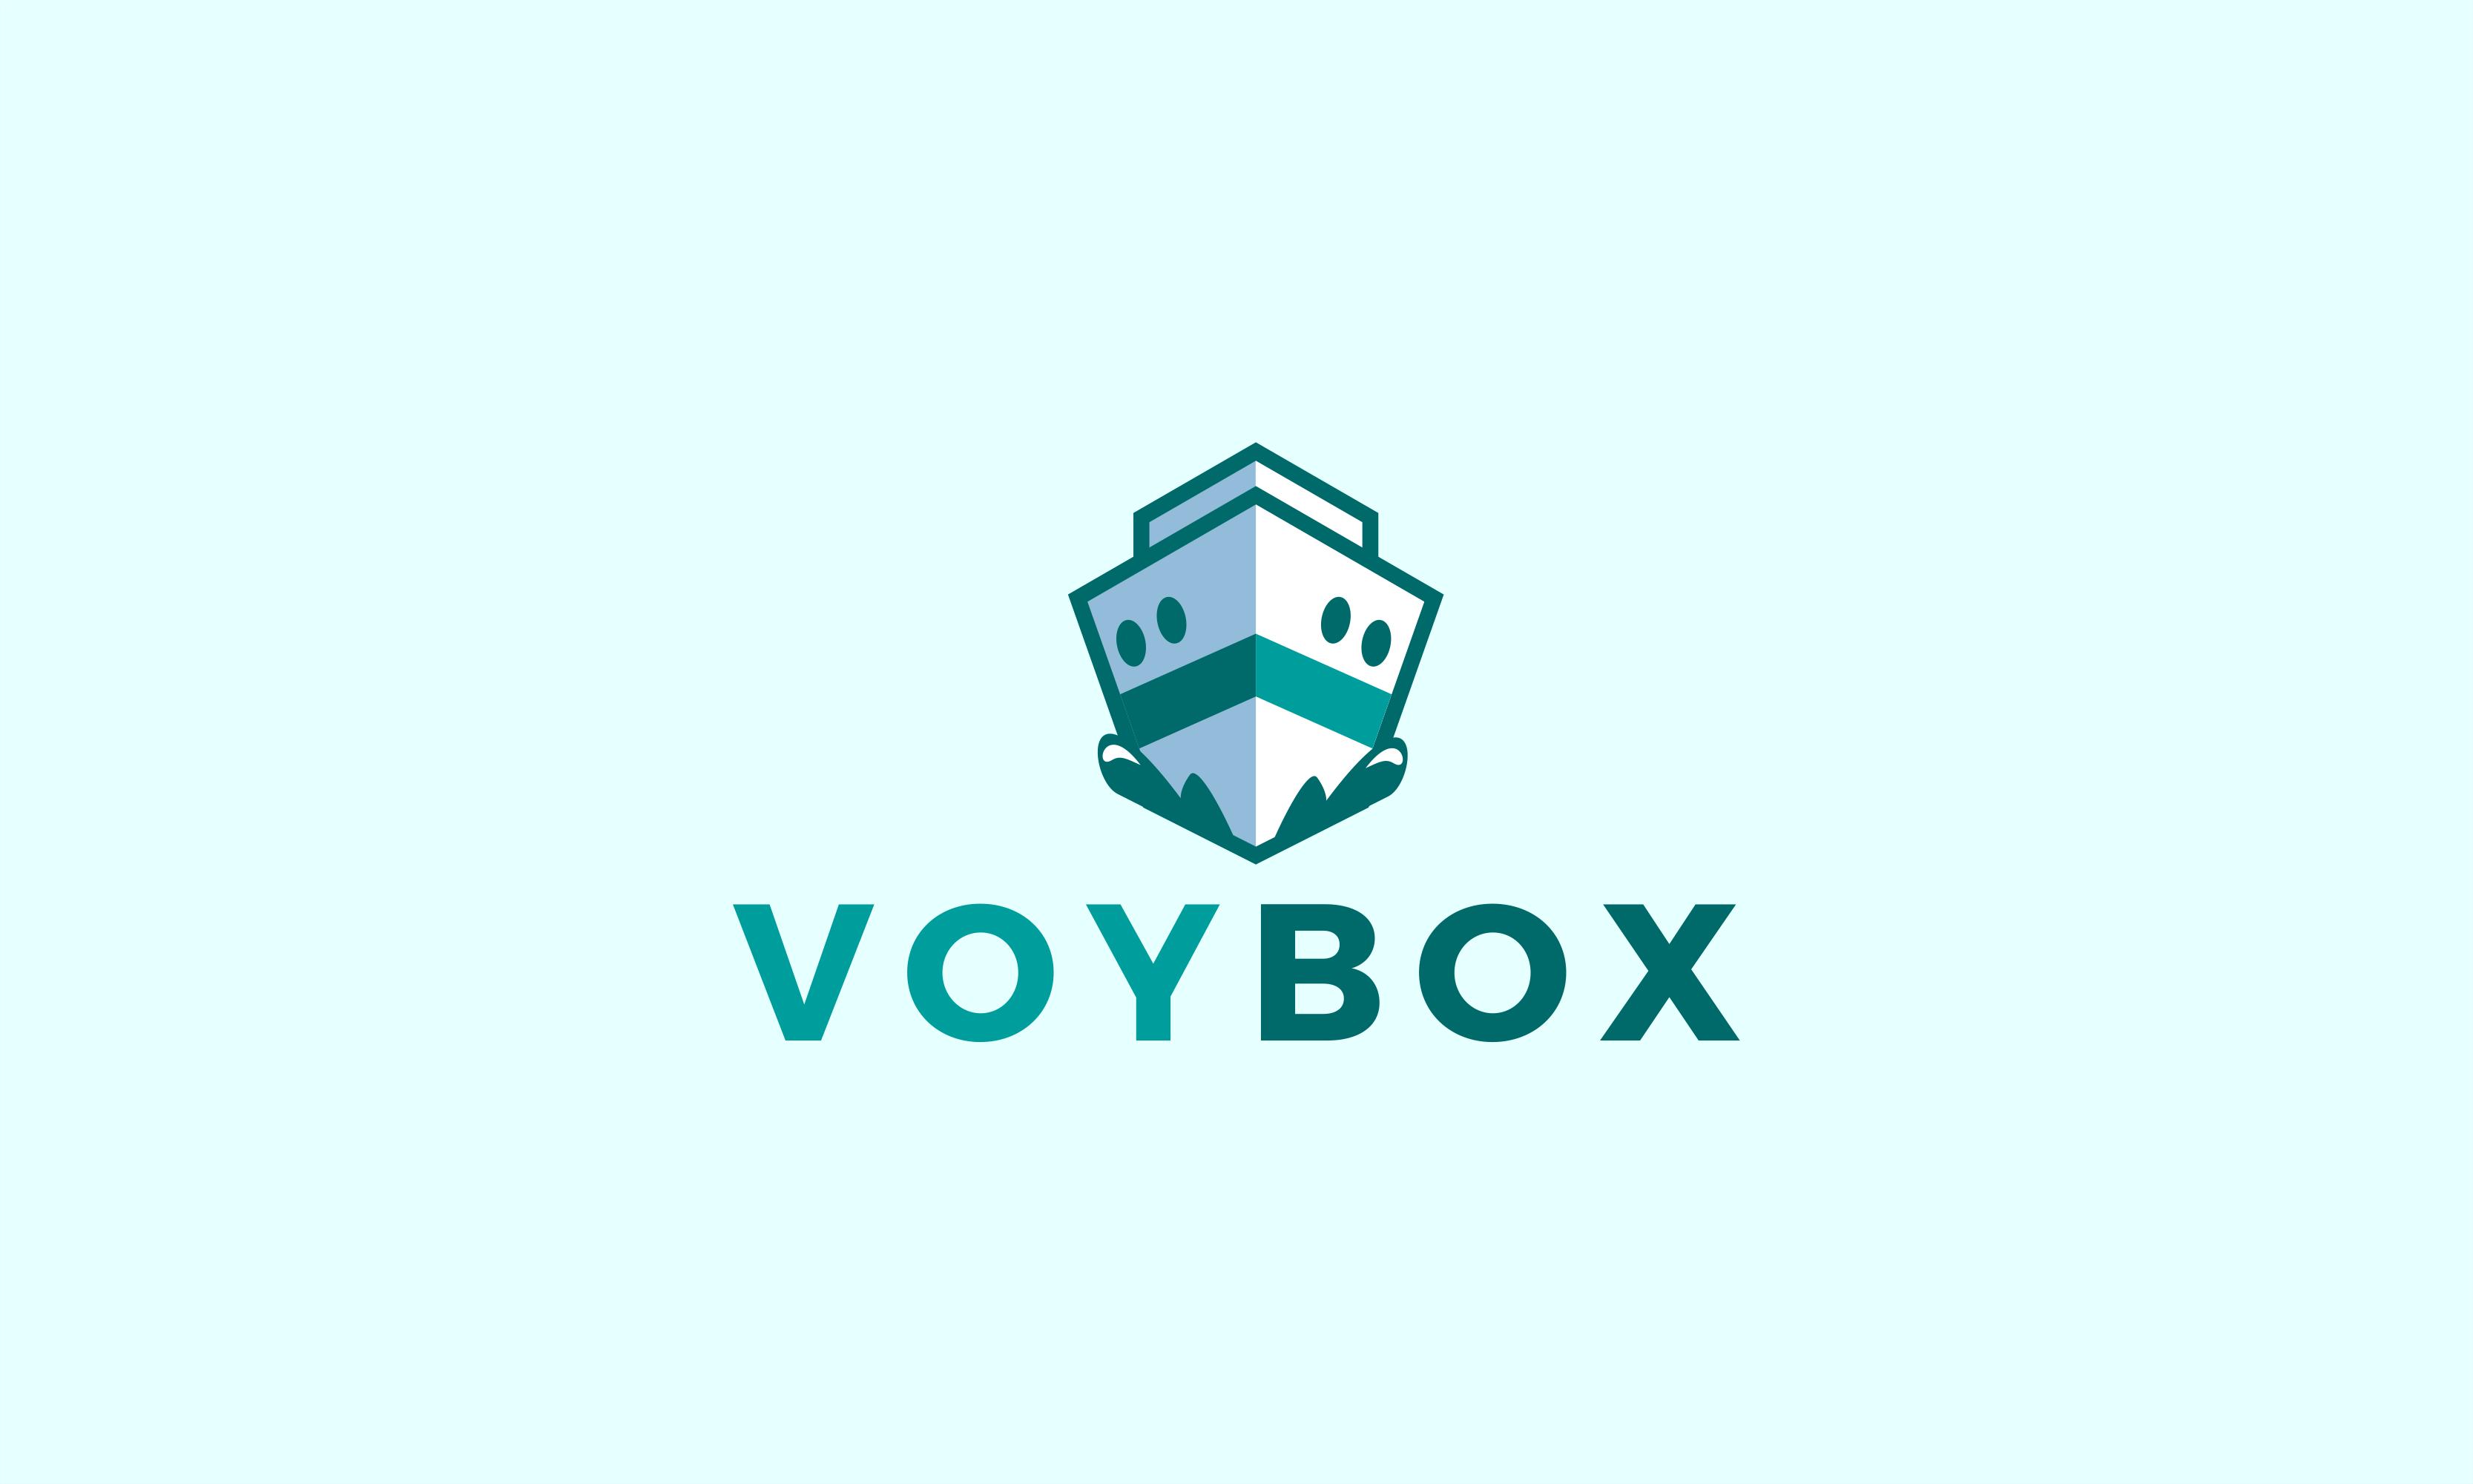 Voybox